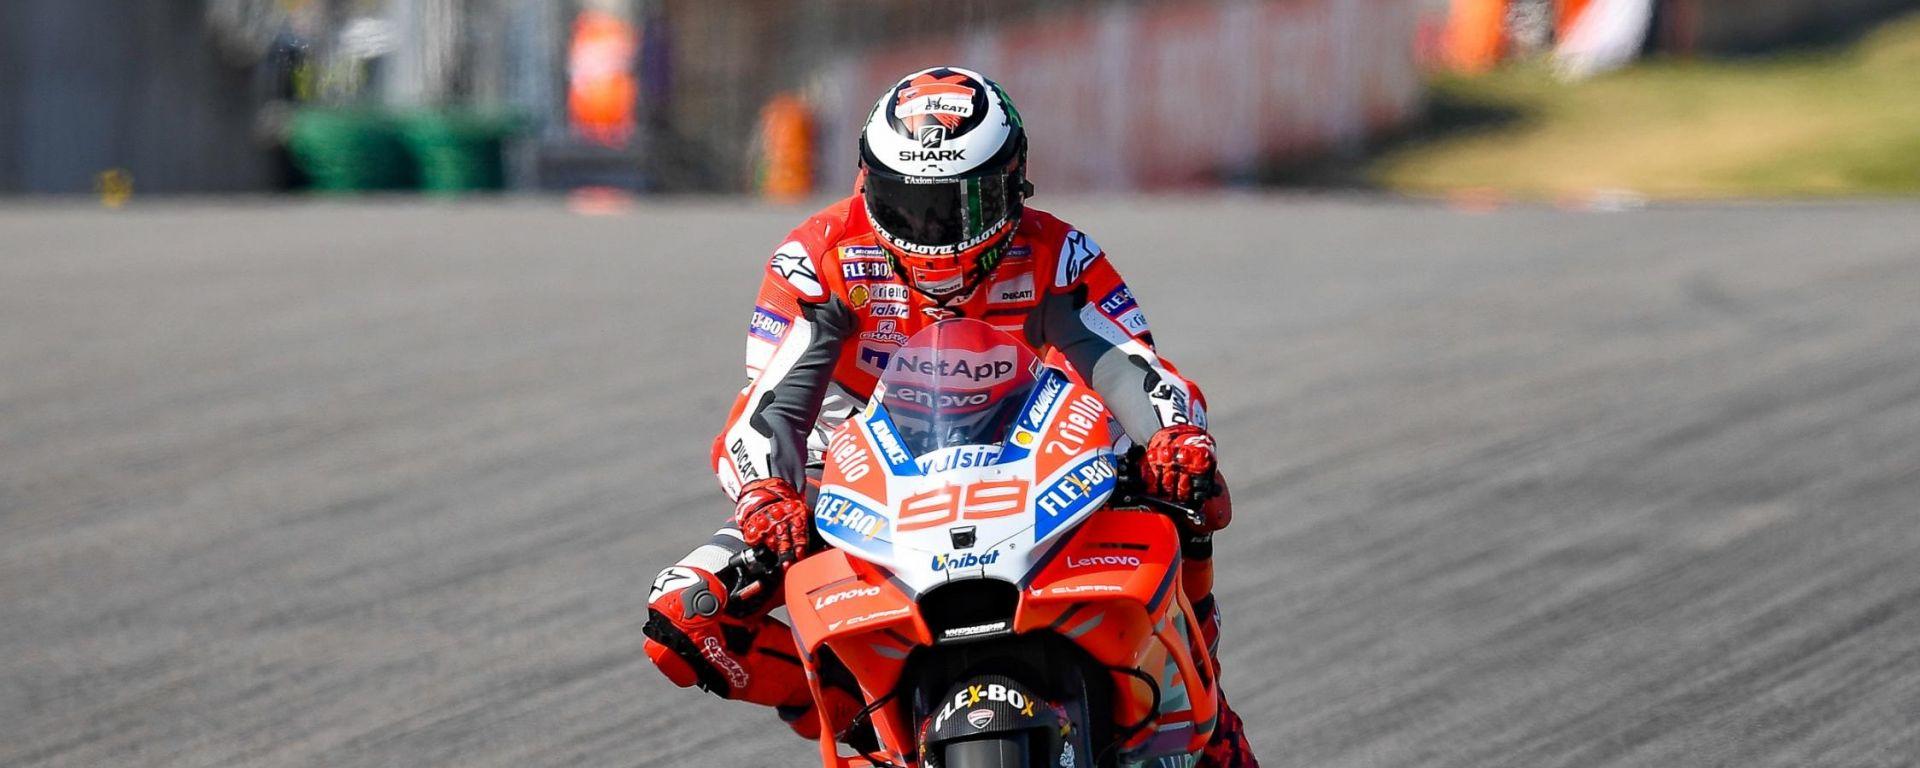 MotoGP Germania 2018, Sachsenring, Jorge Lorenzo in azione